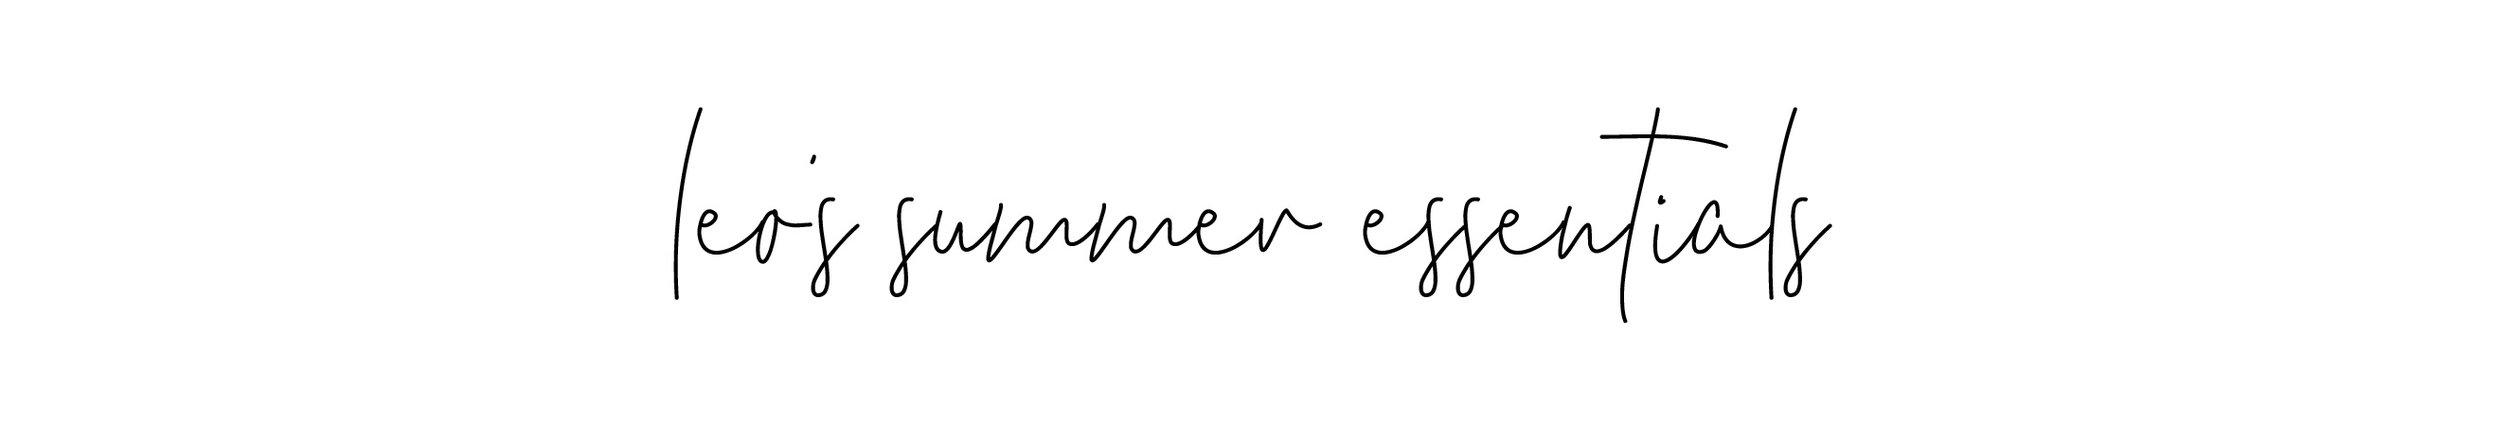 Summer Favorites-07.jpg